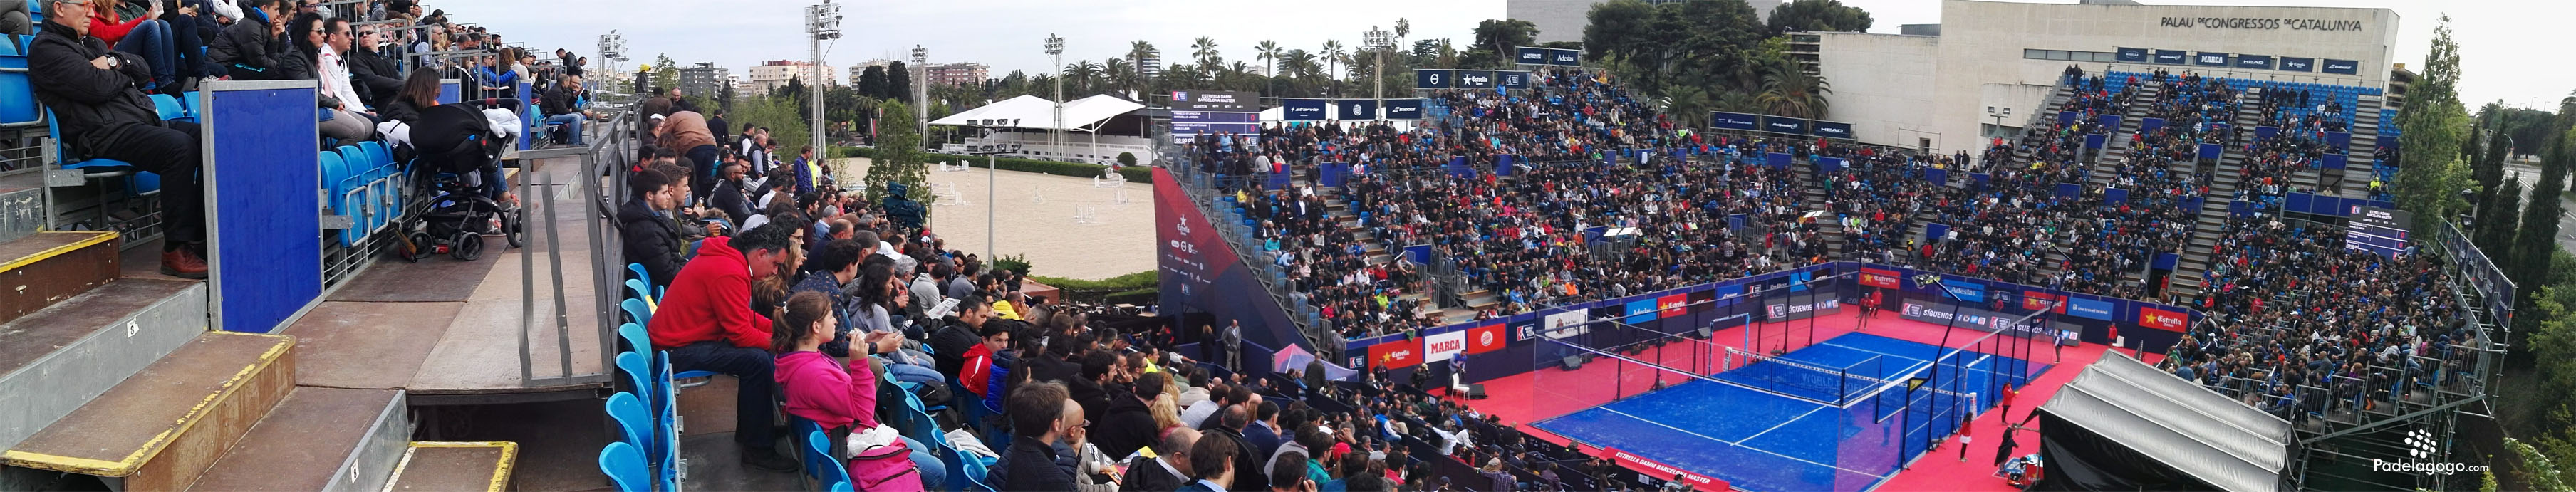 Vista panorámica de la pista central del World Padel Tour barcelona master en el real Club de Polo de Barcelona